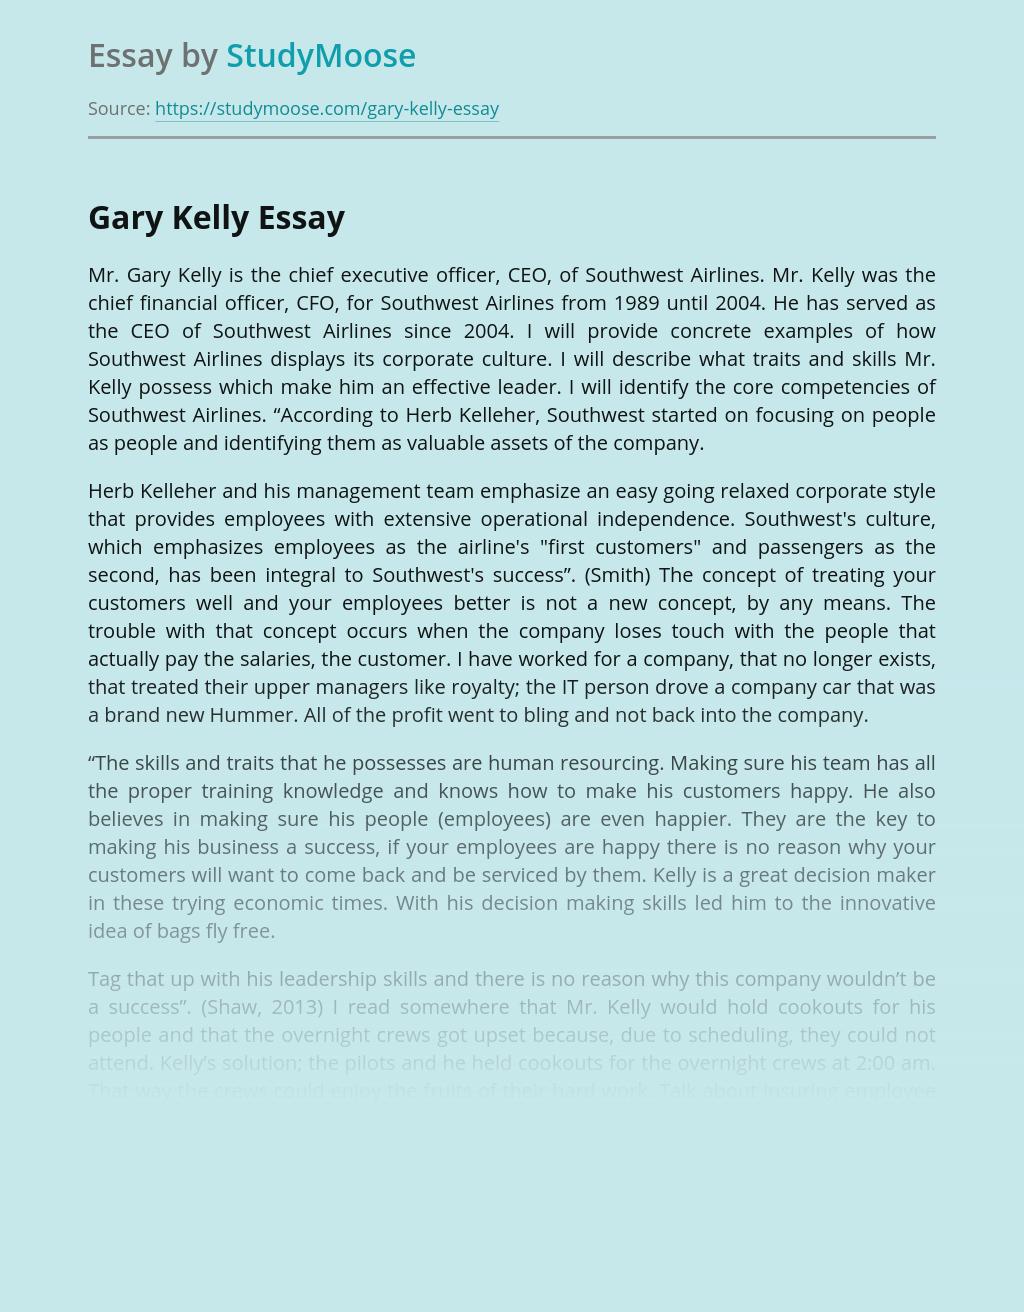 Gary Kelly, an Effective Leader